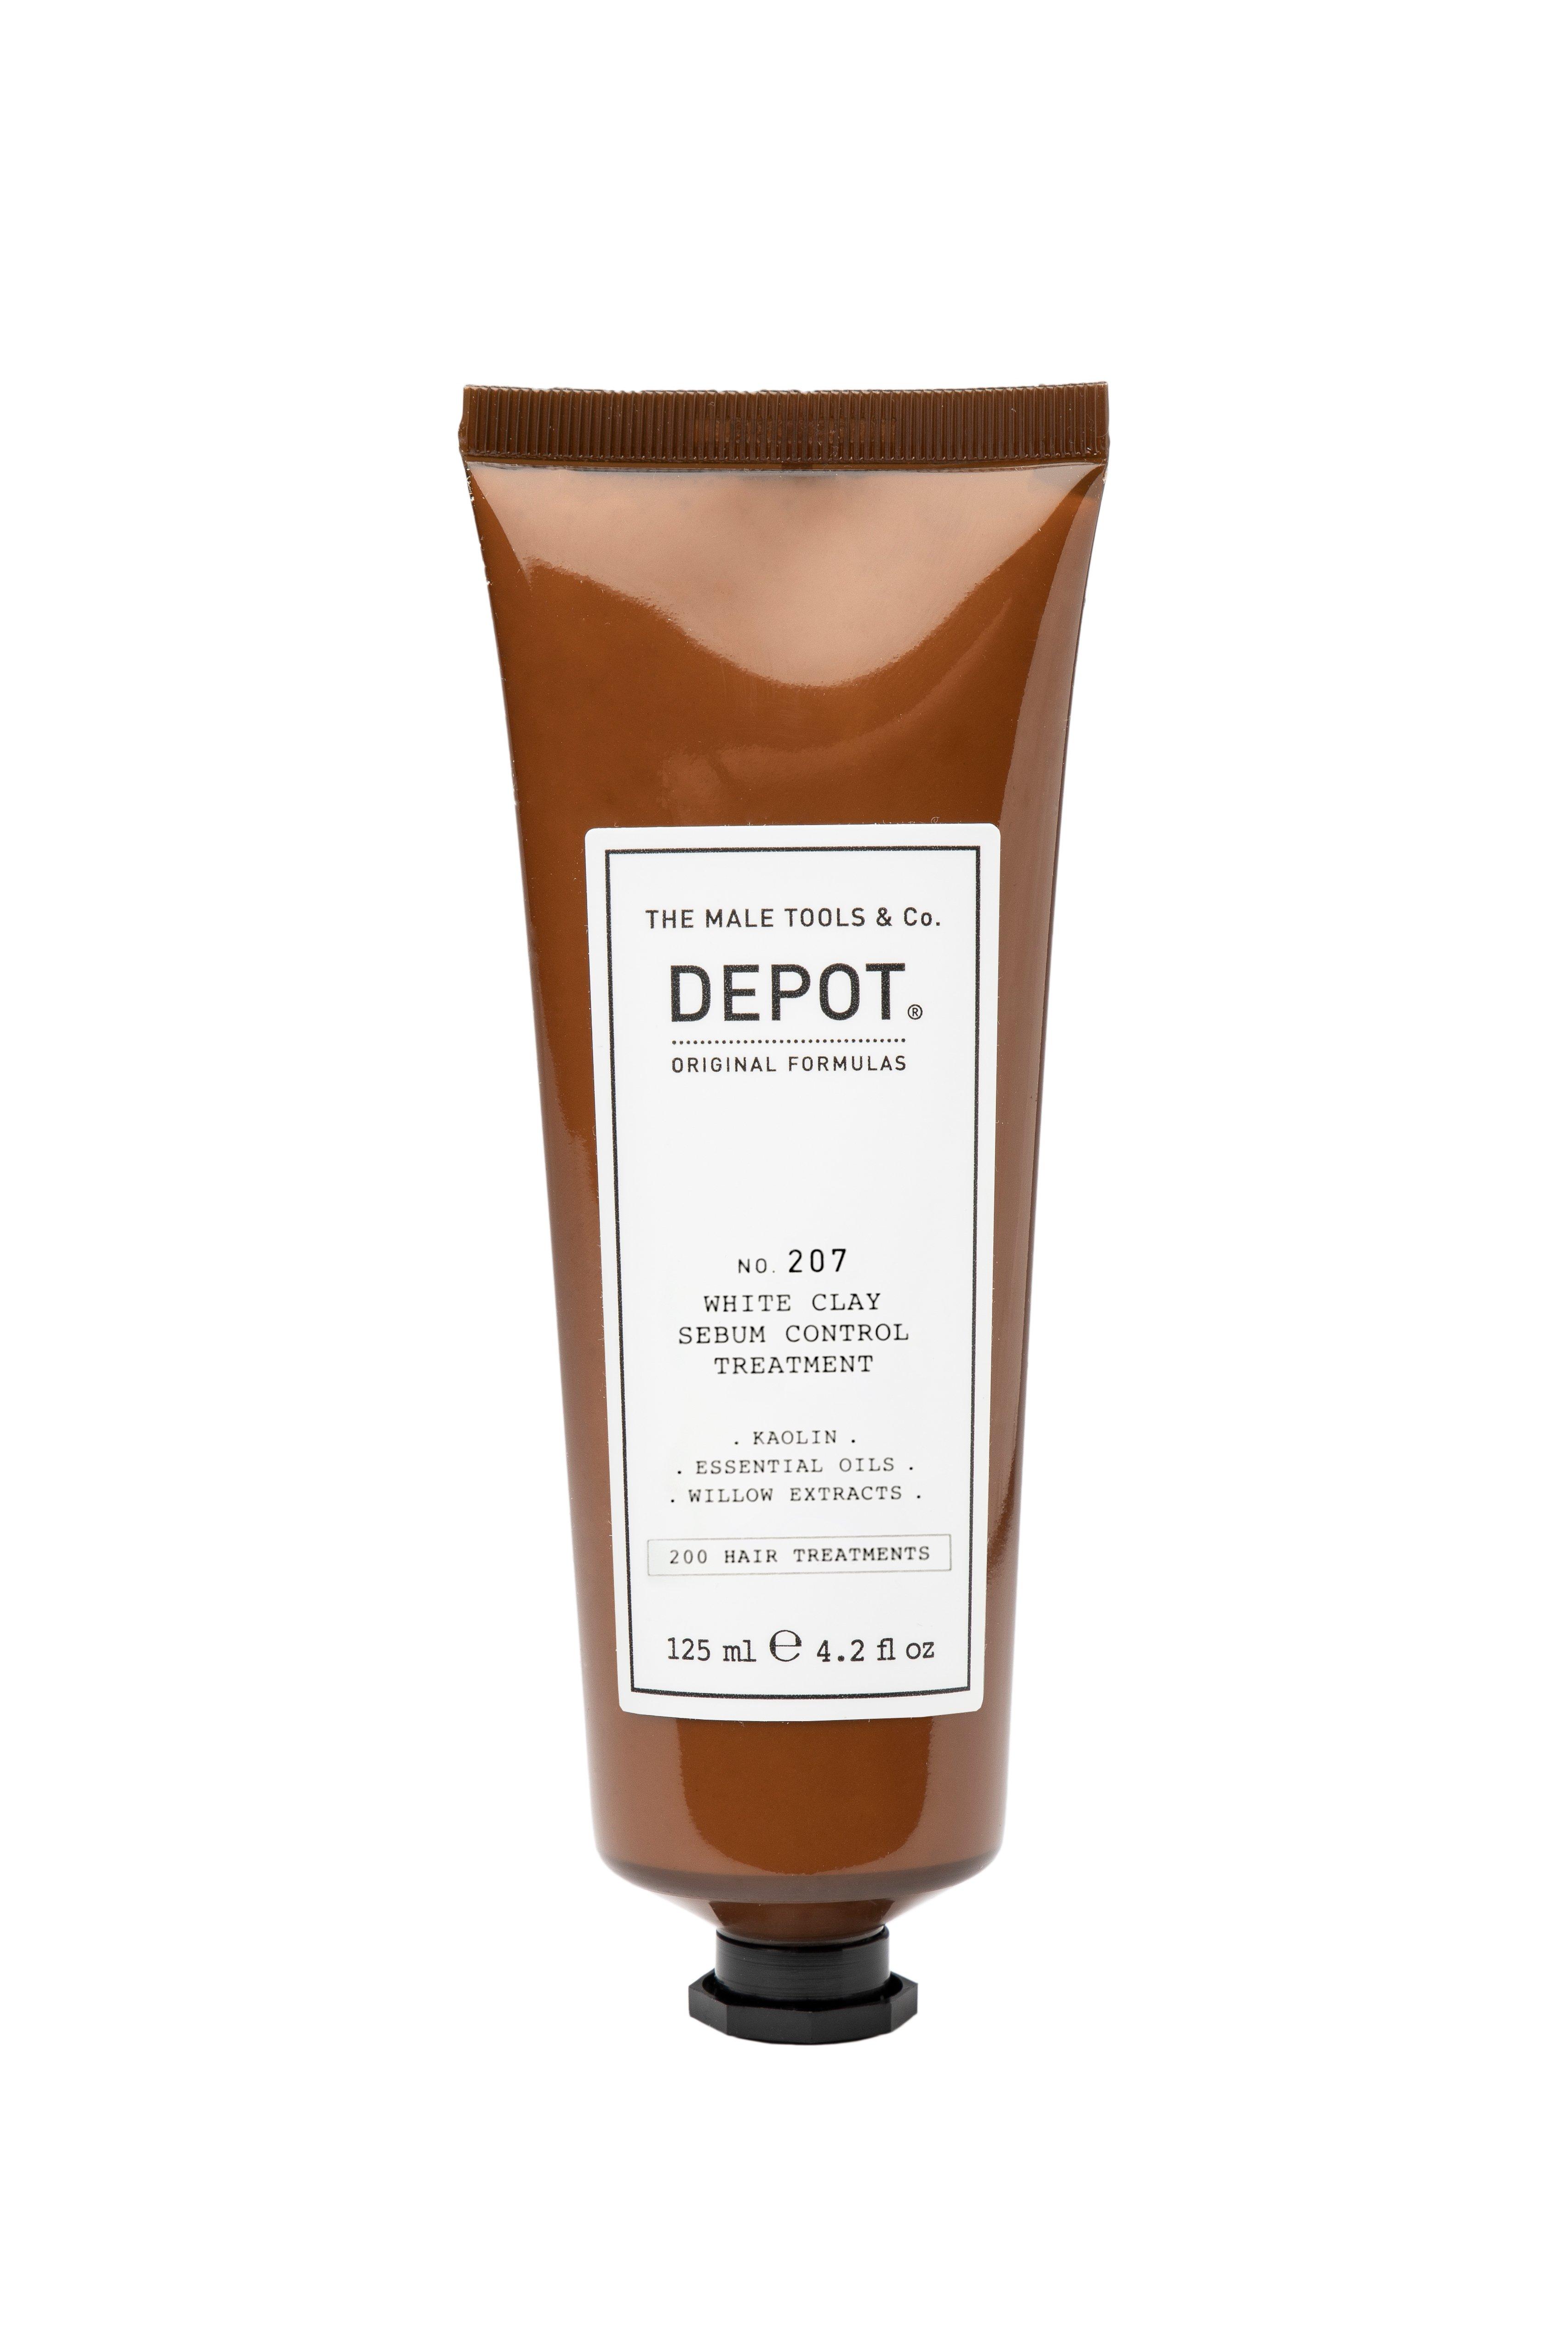 Depot - No. 207 White Clay Serum Control Treatment - 125 ml